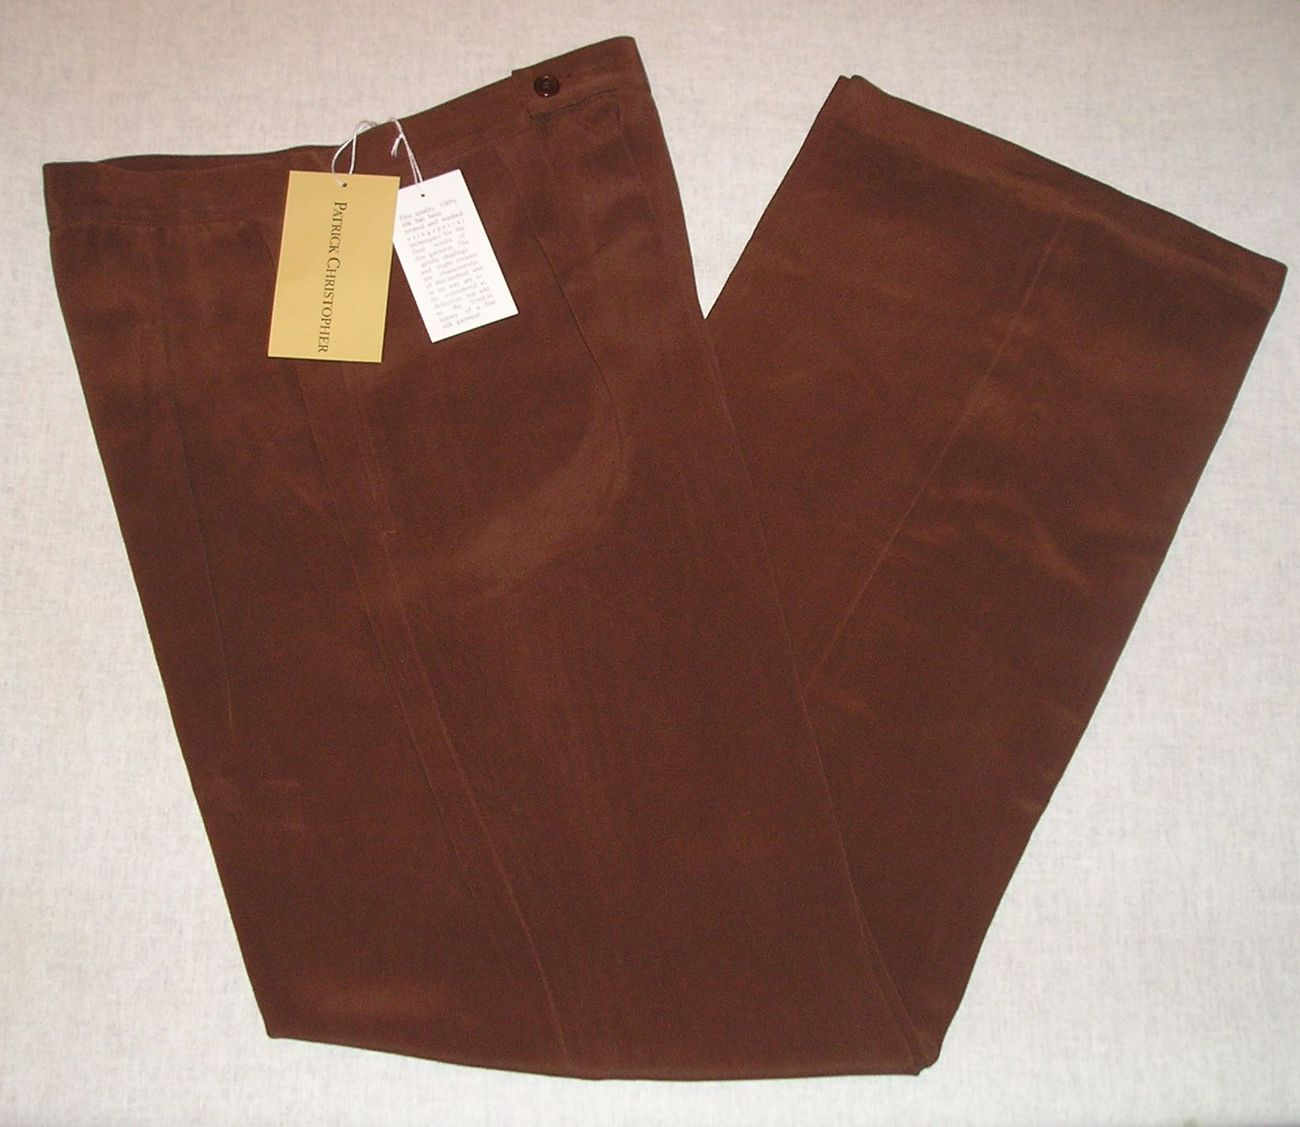 NEW PATRICK CHRISTOPHER Women's 100% Silk Cocoa Dress Pants 8 Medium M